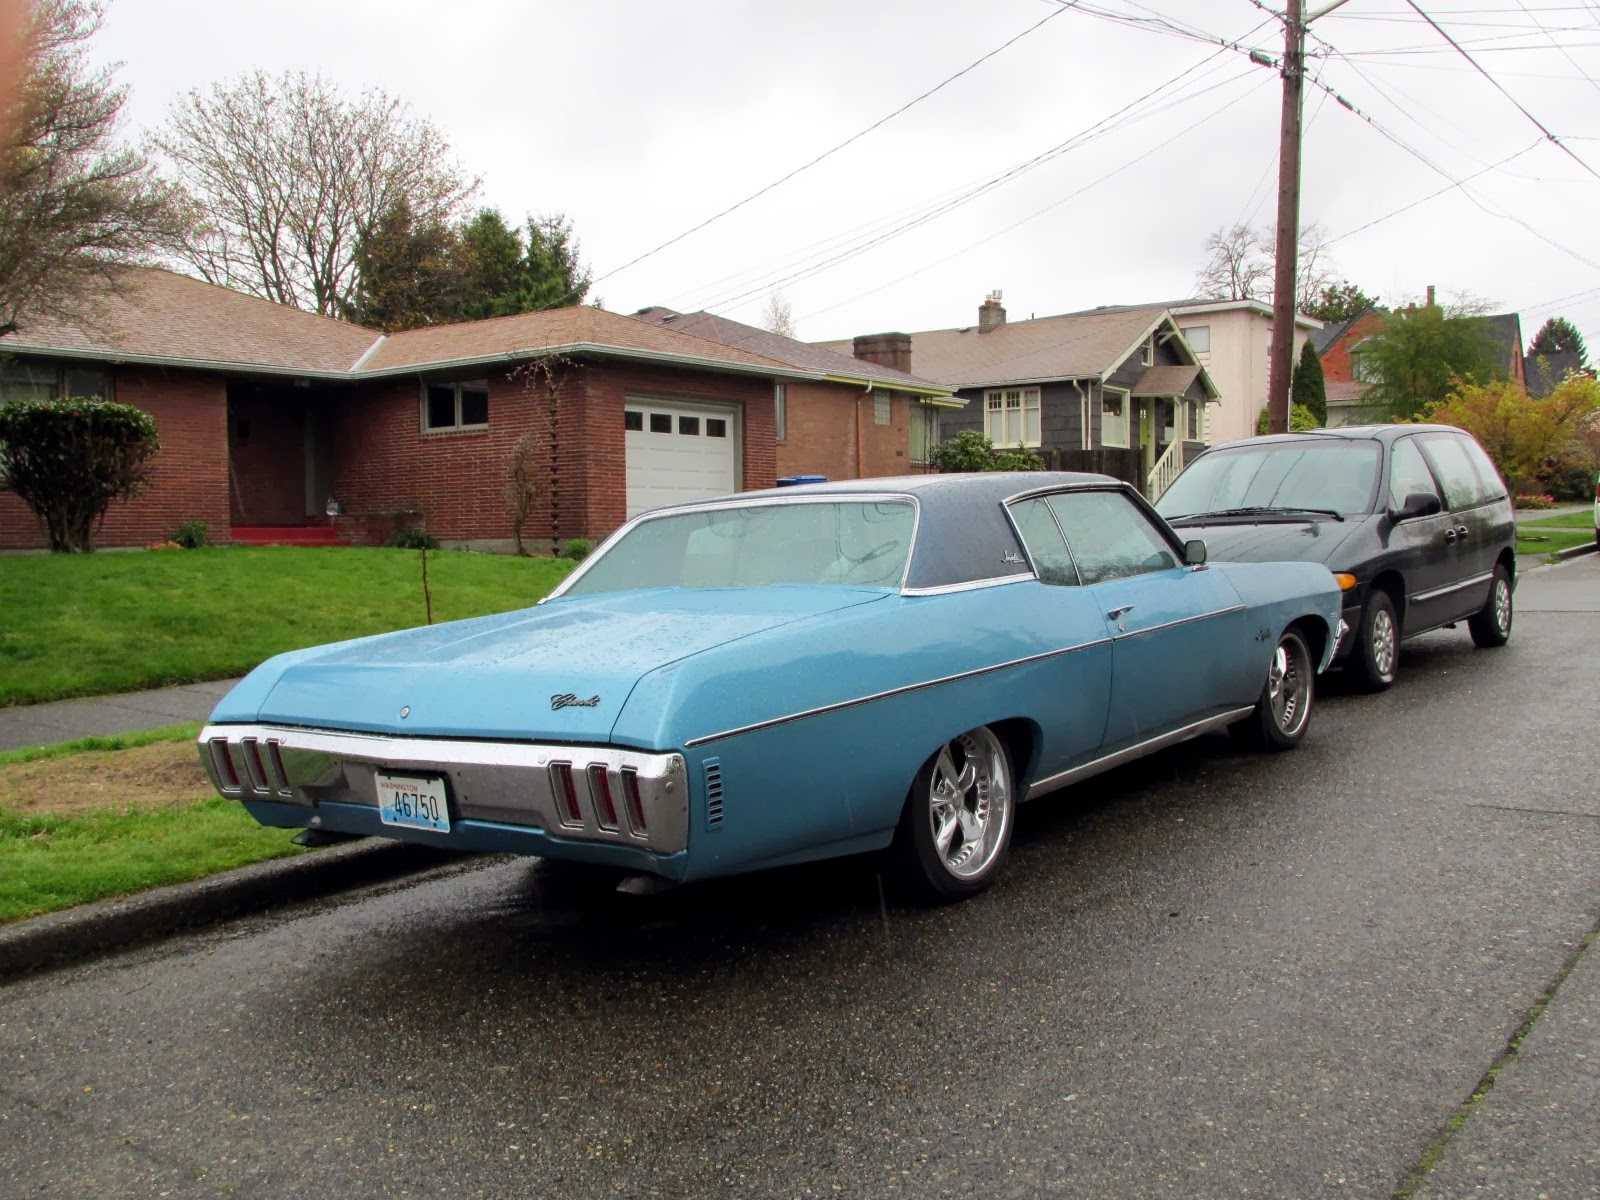 Warsaw In Chevrolet >> Seattle's Classics: 1970 Chevrolet Impala Custom